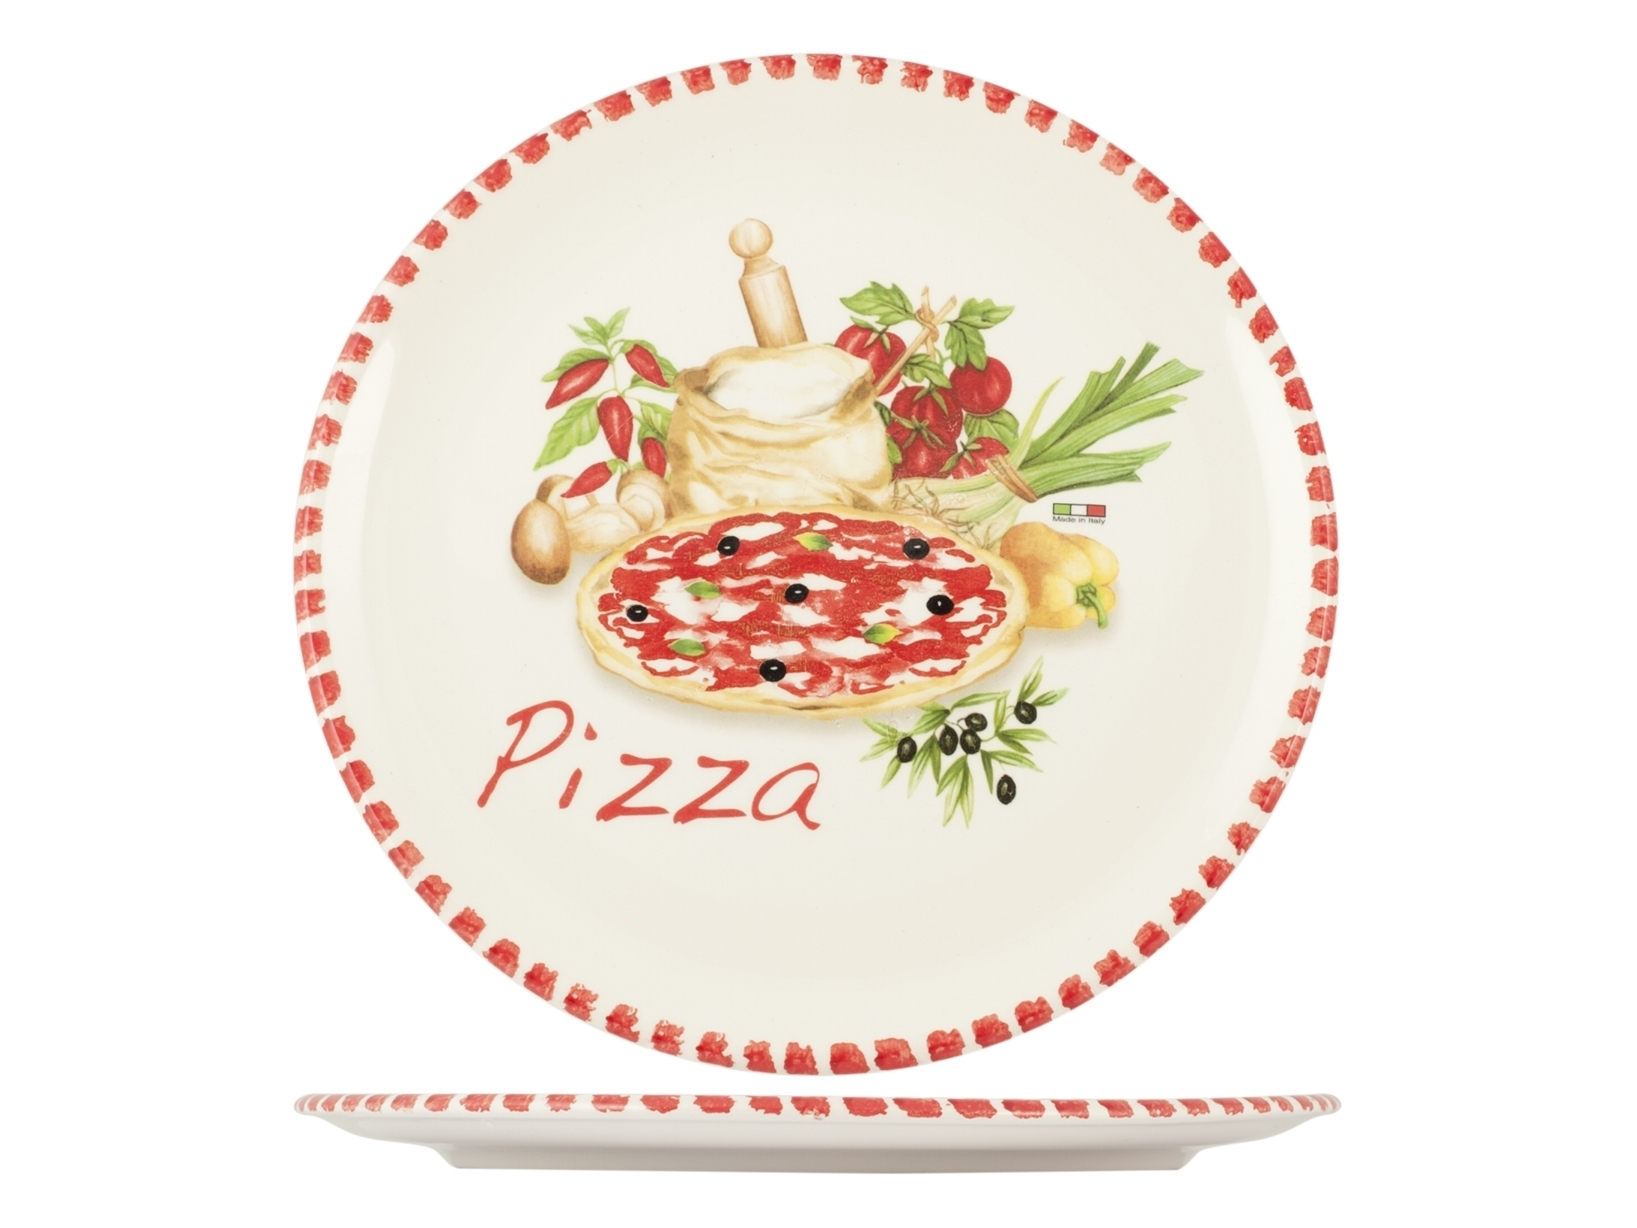 Buy Cm34 Pizza Plate Ceramic 17457651 | Italy2Us.com